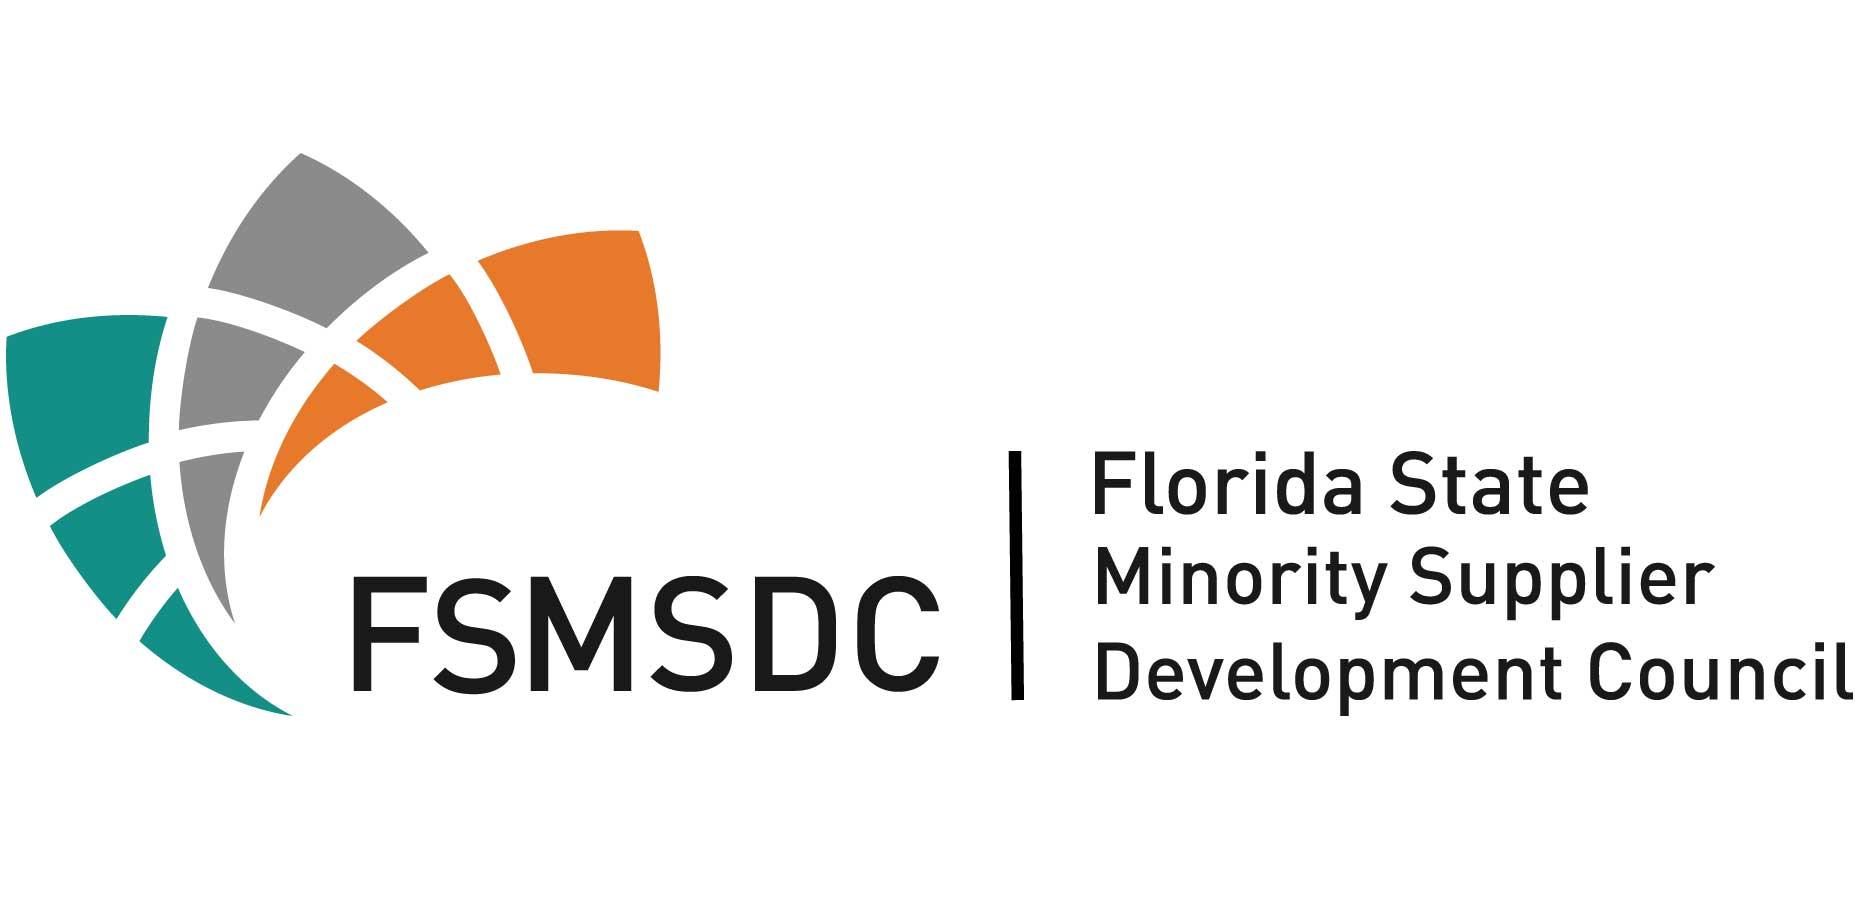 Florida State Minority Supplier Development Council